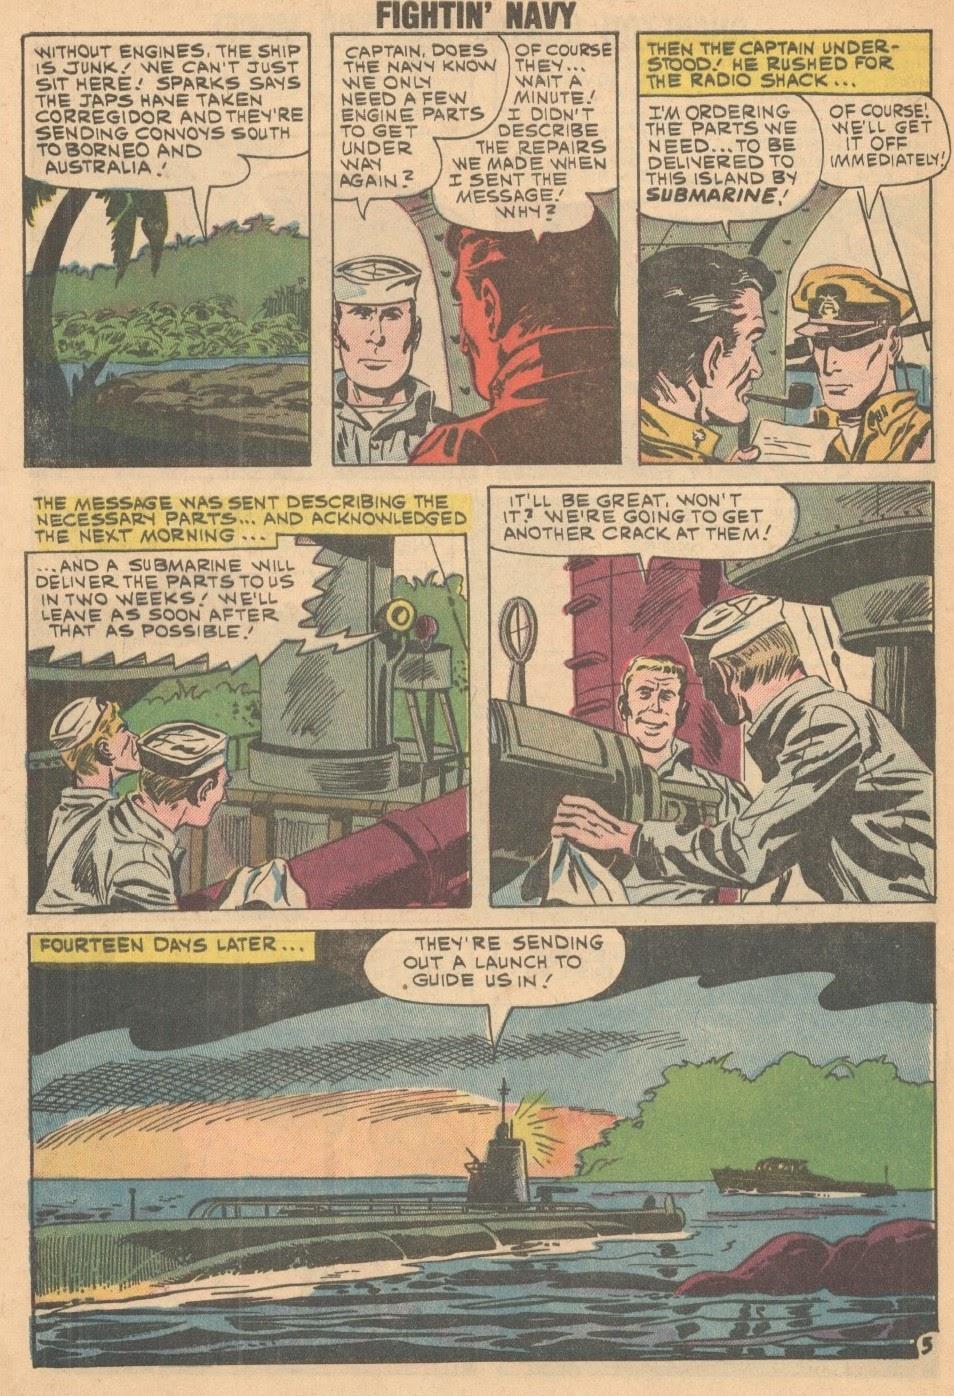 Read online Fightin' Navy comic -  Issue #93 - 8